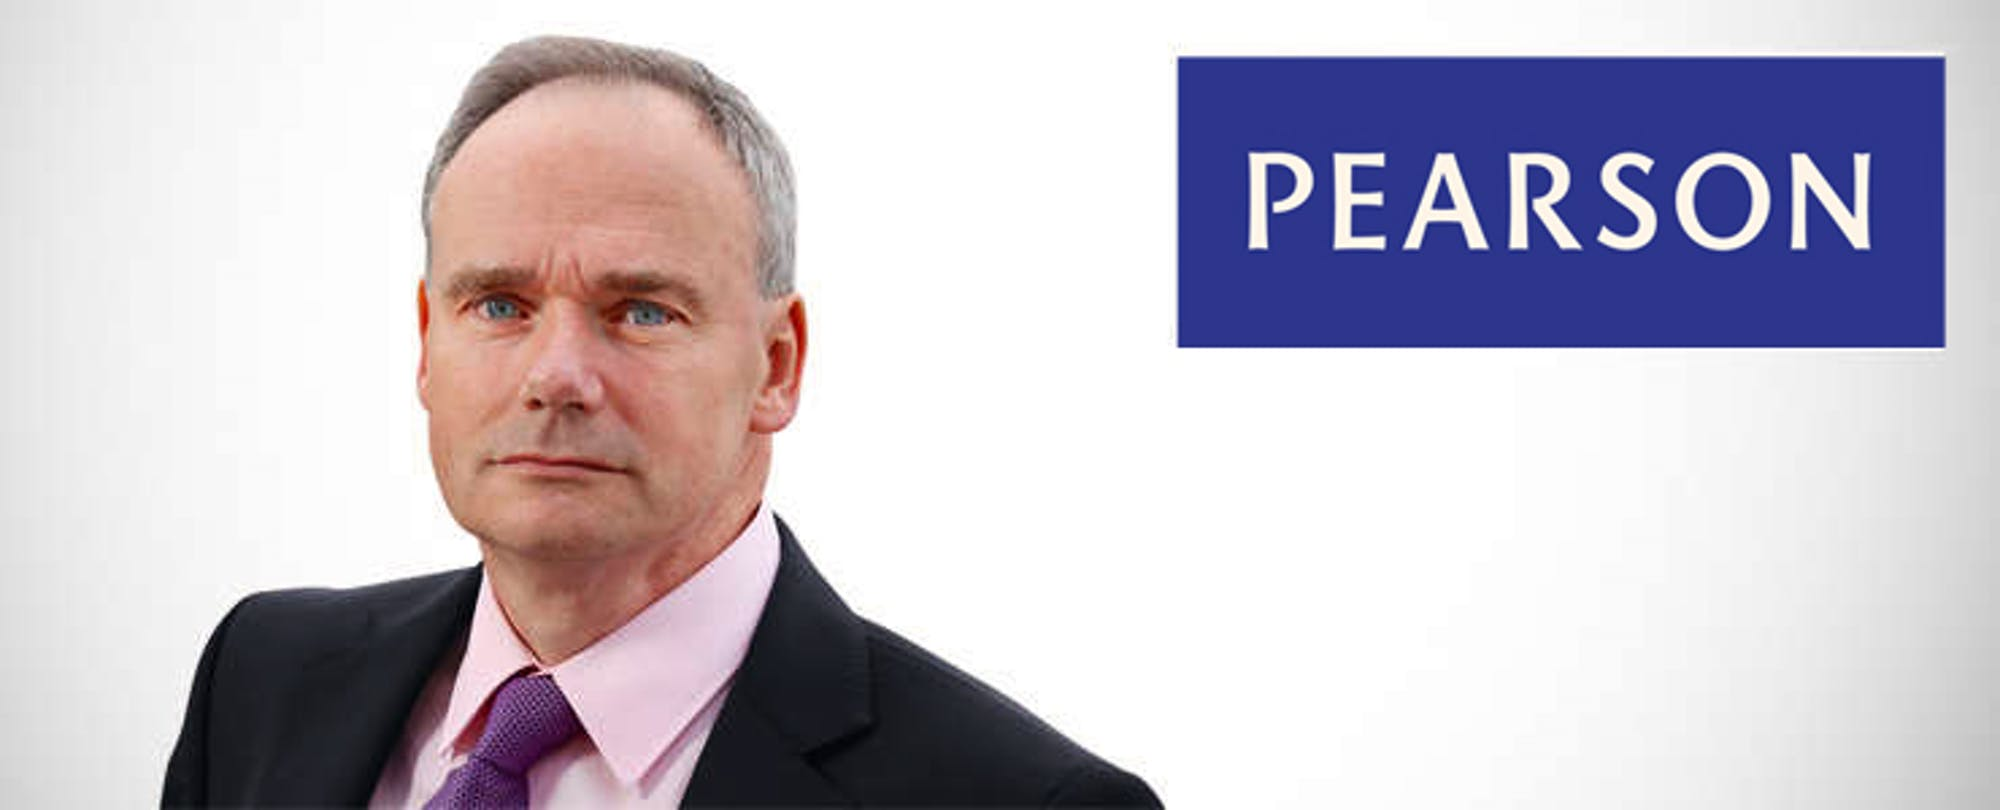 Pearson CEO Shares His Road Ahead